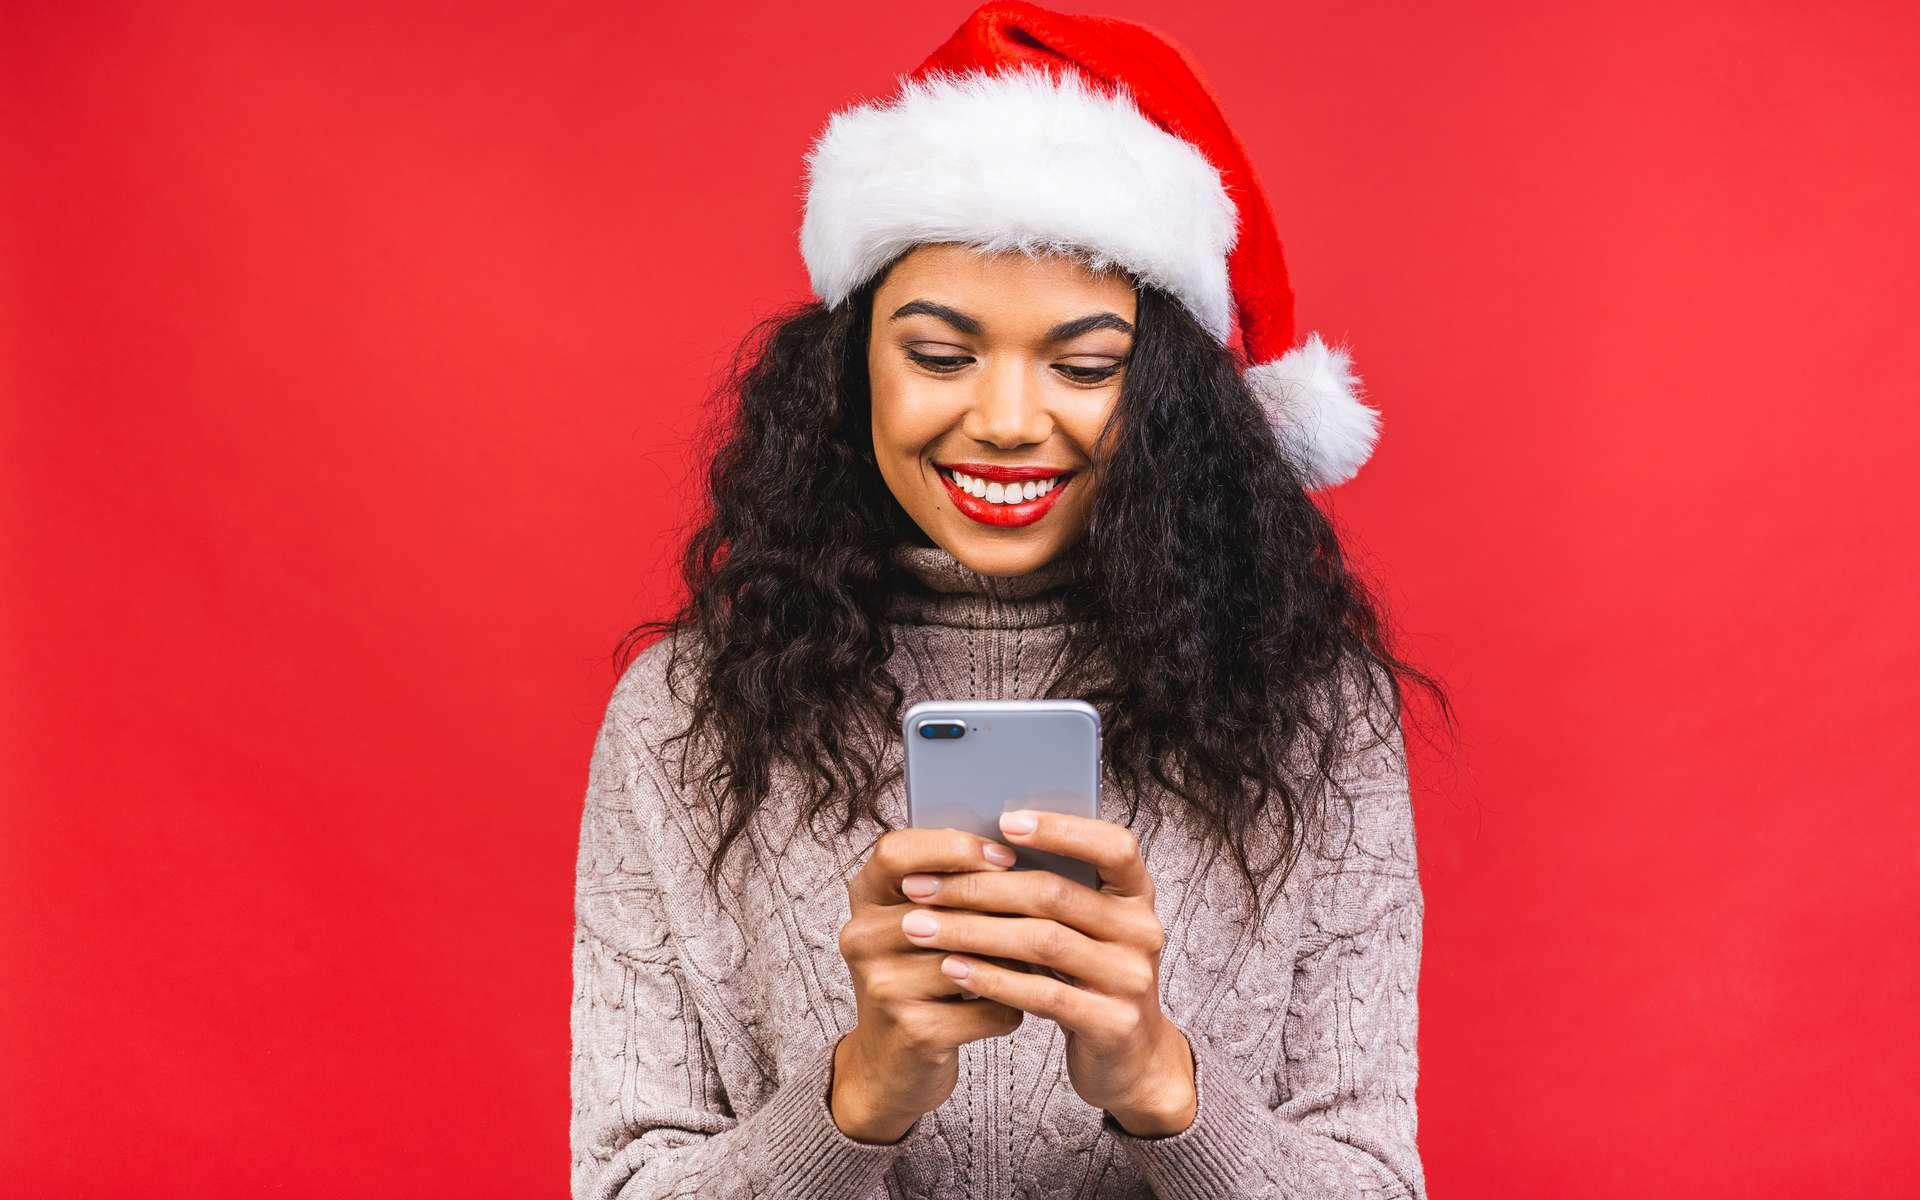 Les bons plans forfait mobile pour Noël 2020 © denis_vermenko, Adobe Stock